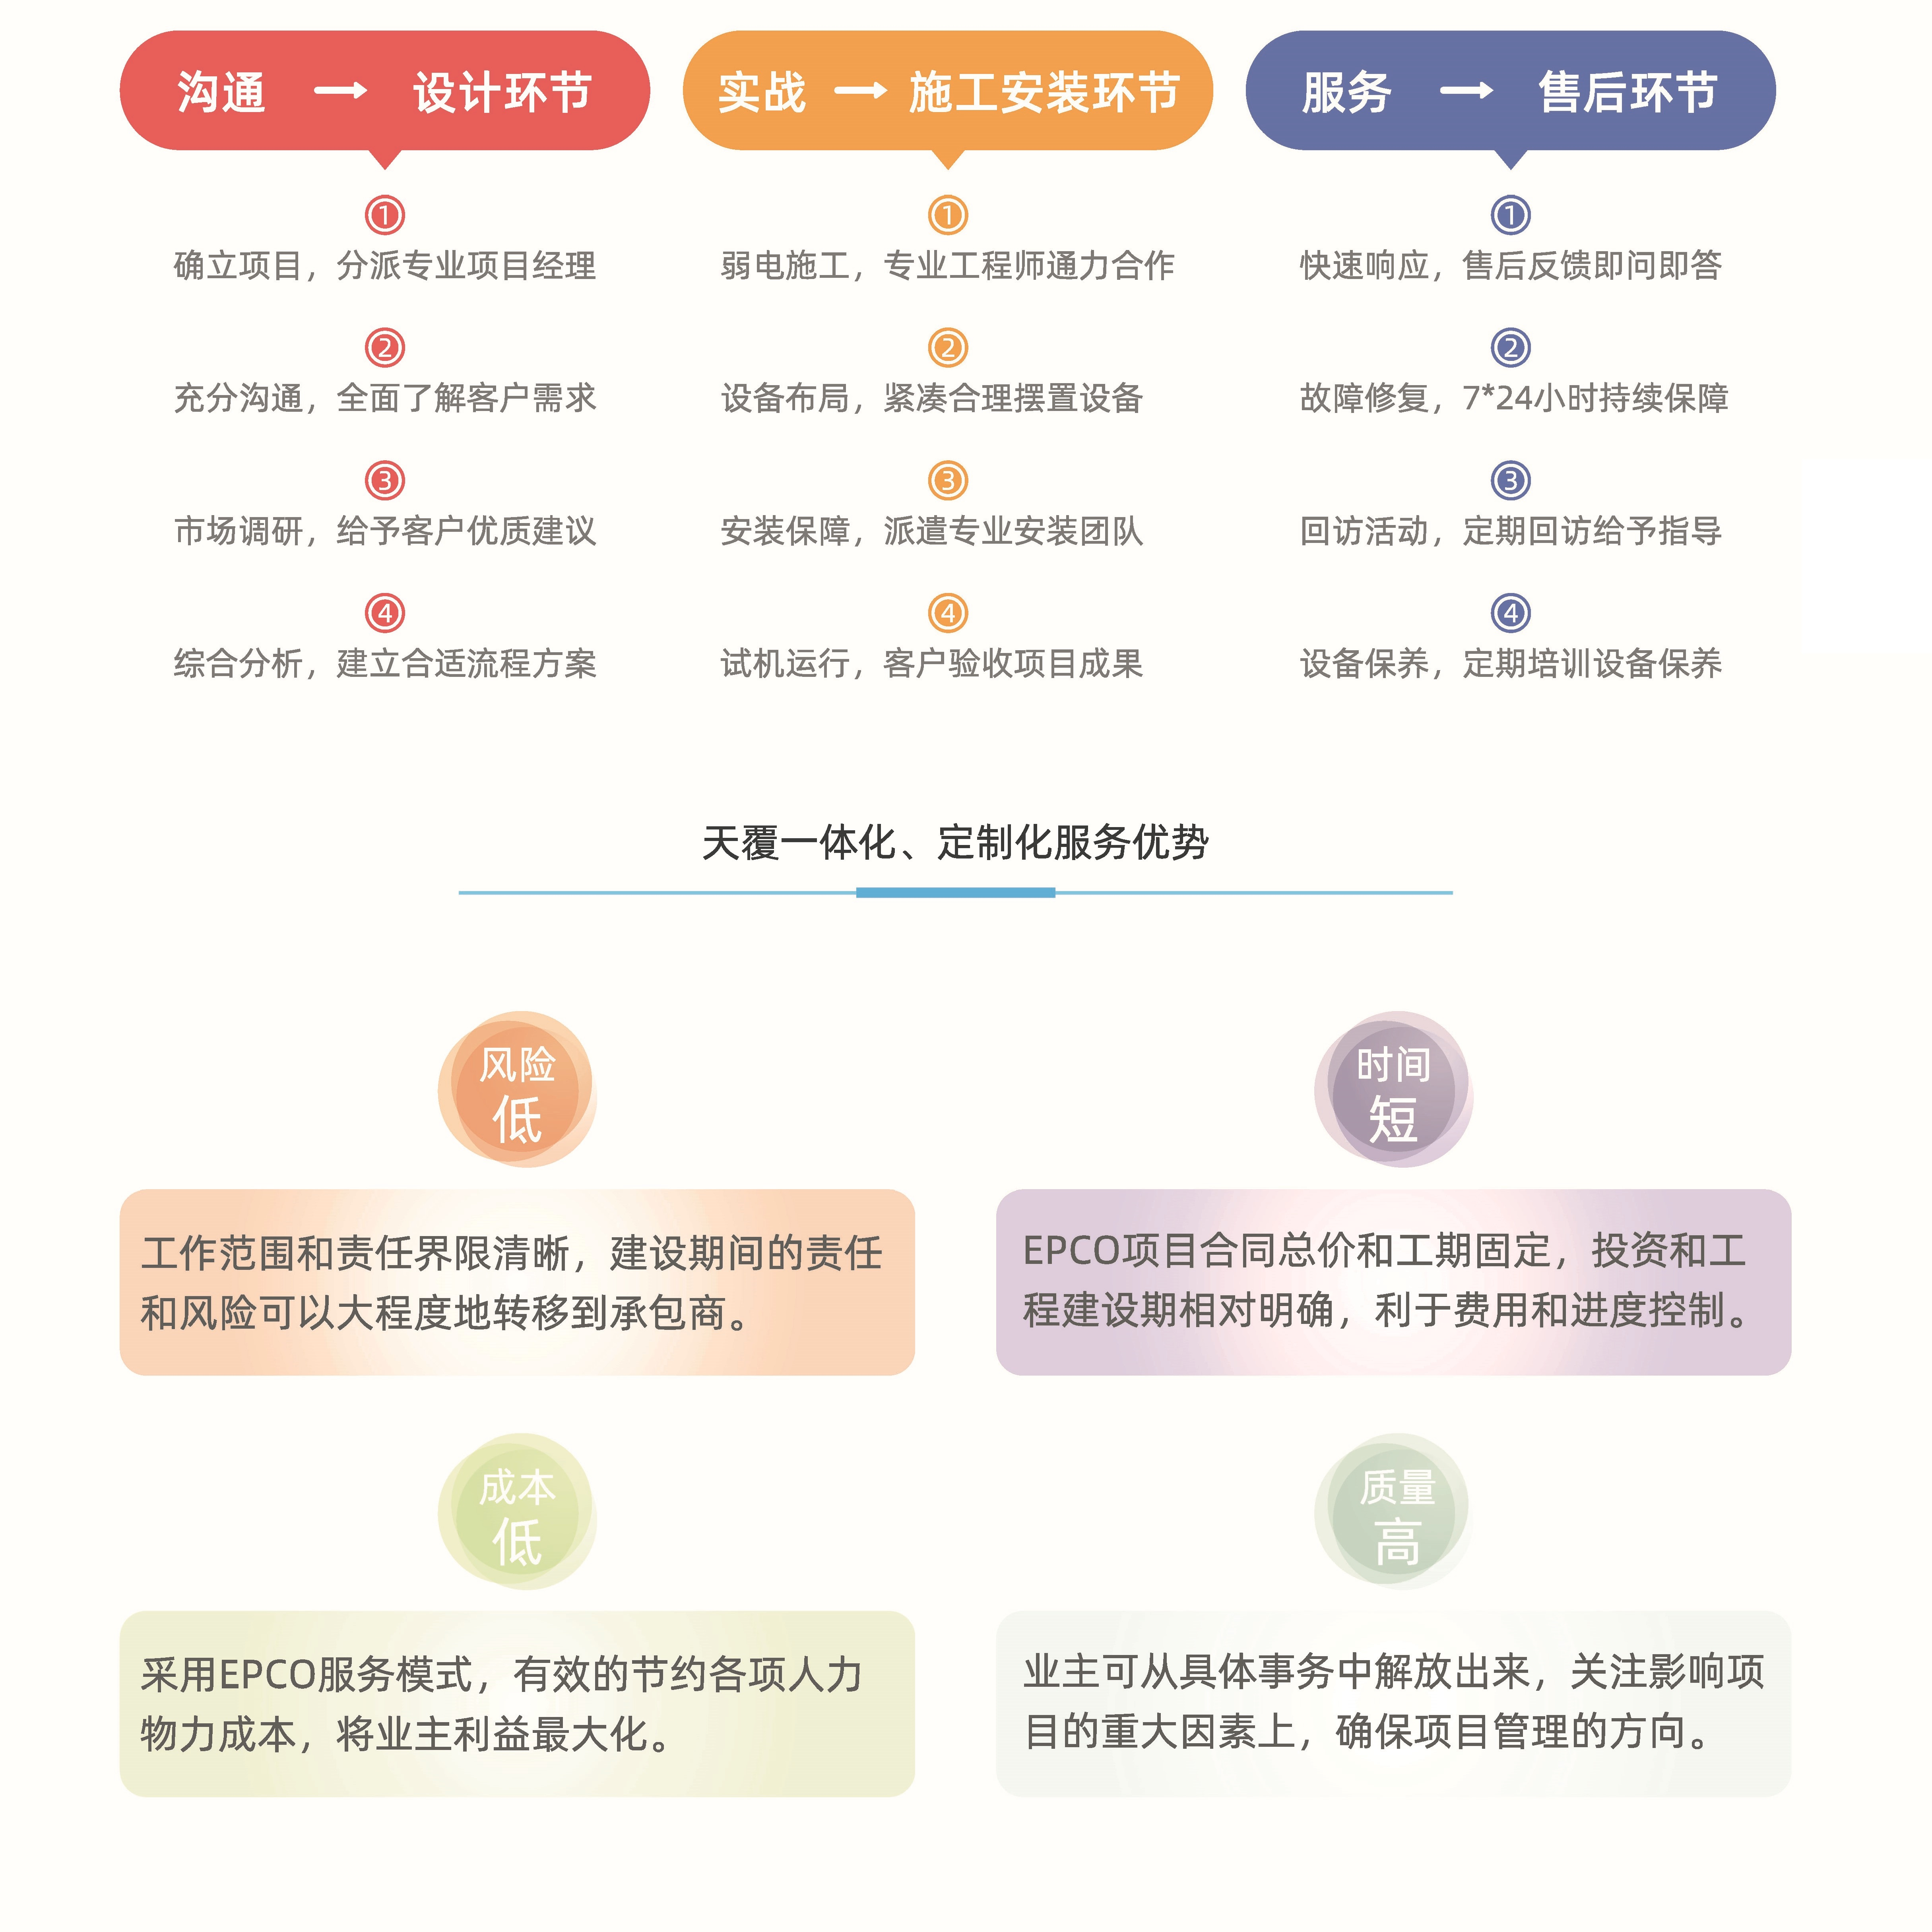 services-details-11 (1).jpg